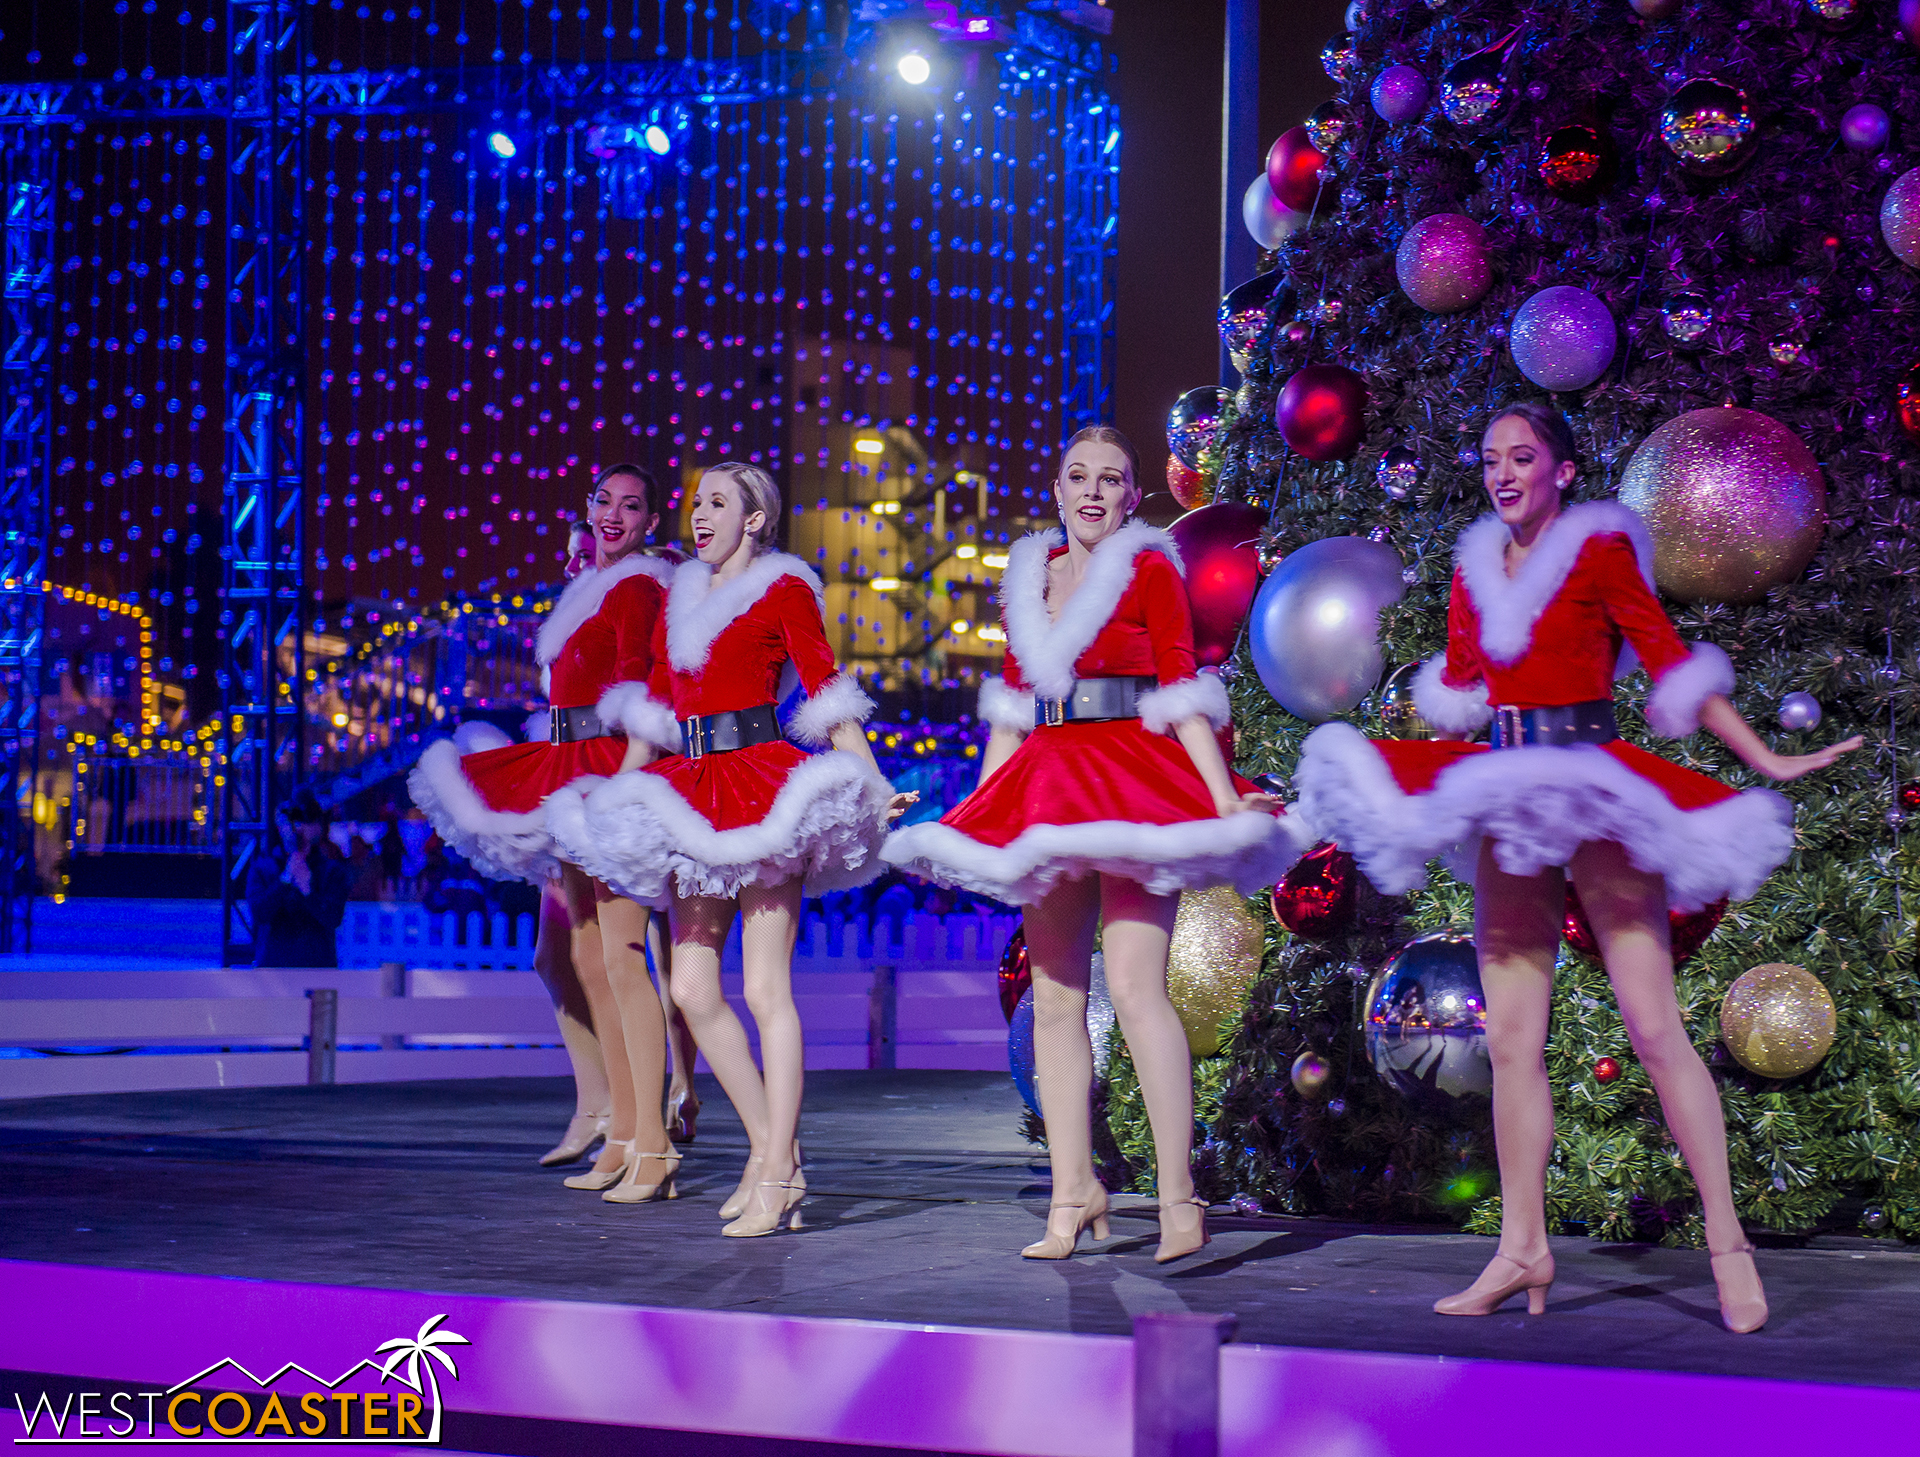 Chill-17_1215-Show-Dancers&Lights-0001.jpg